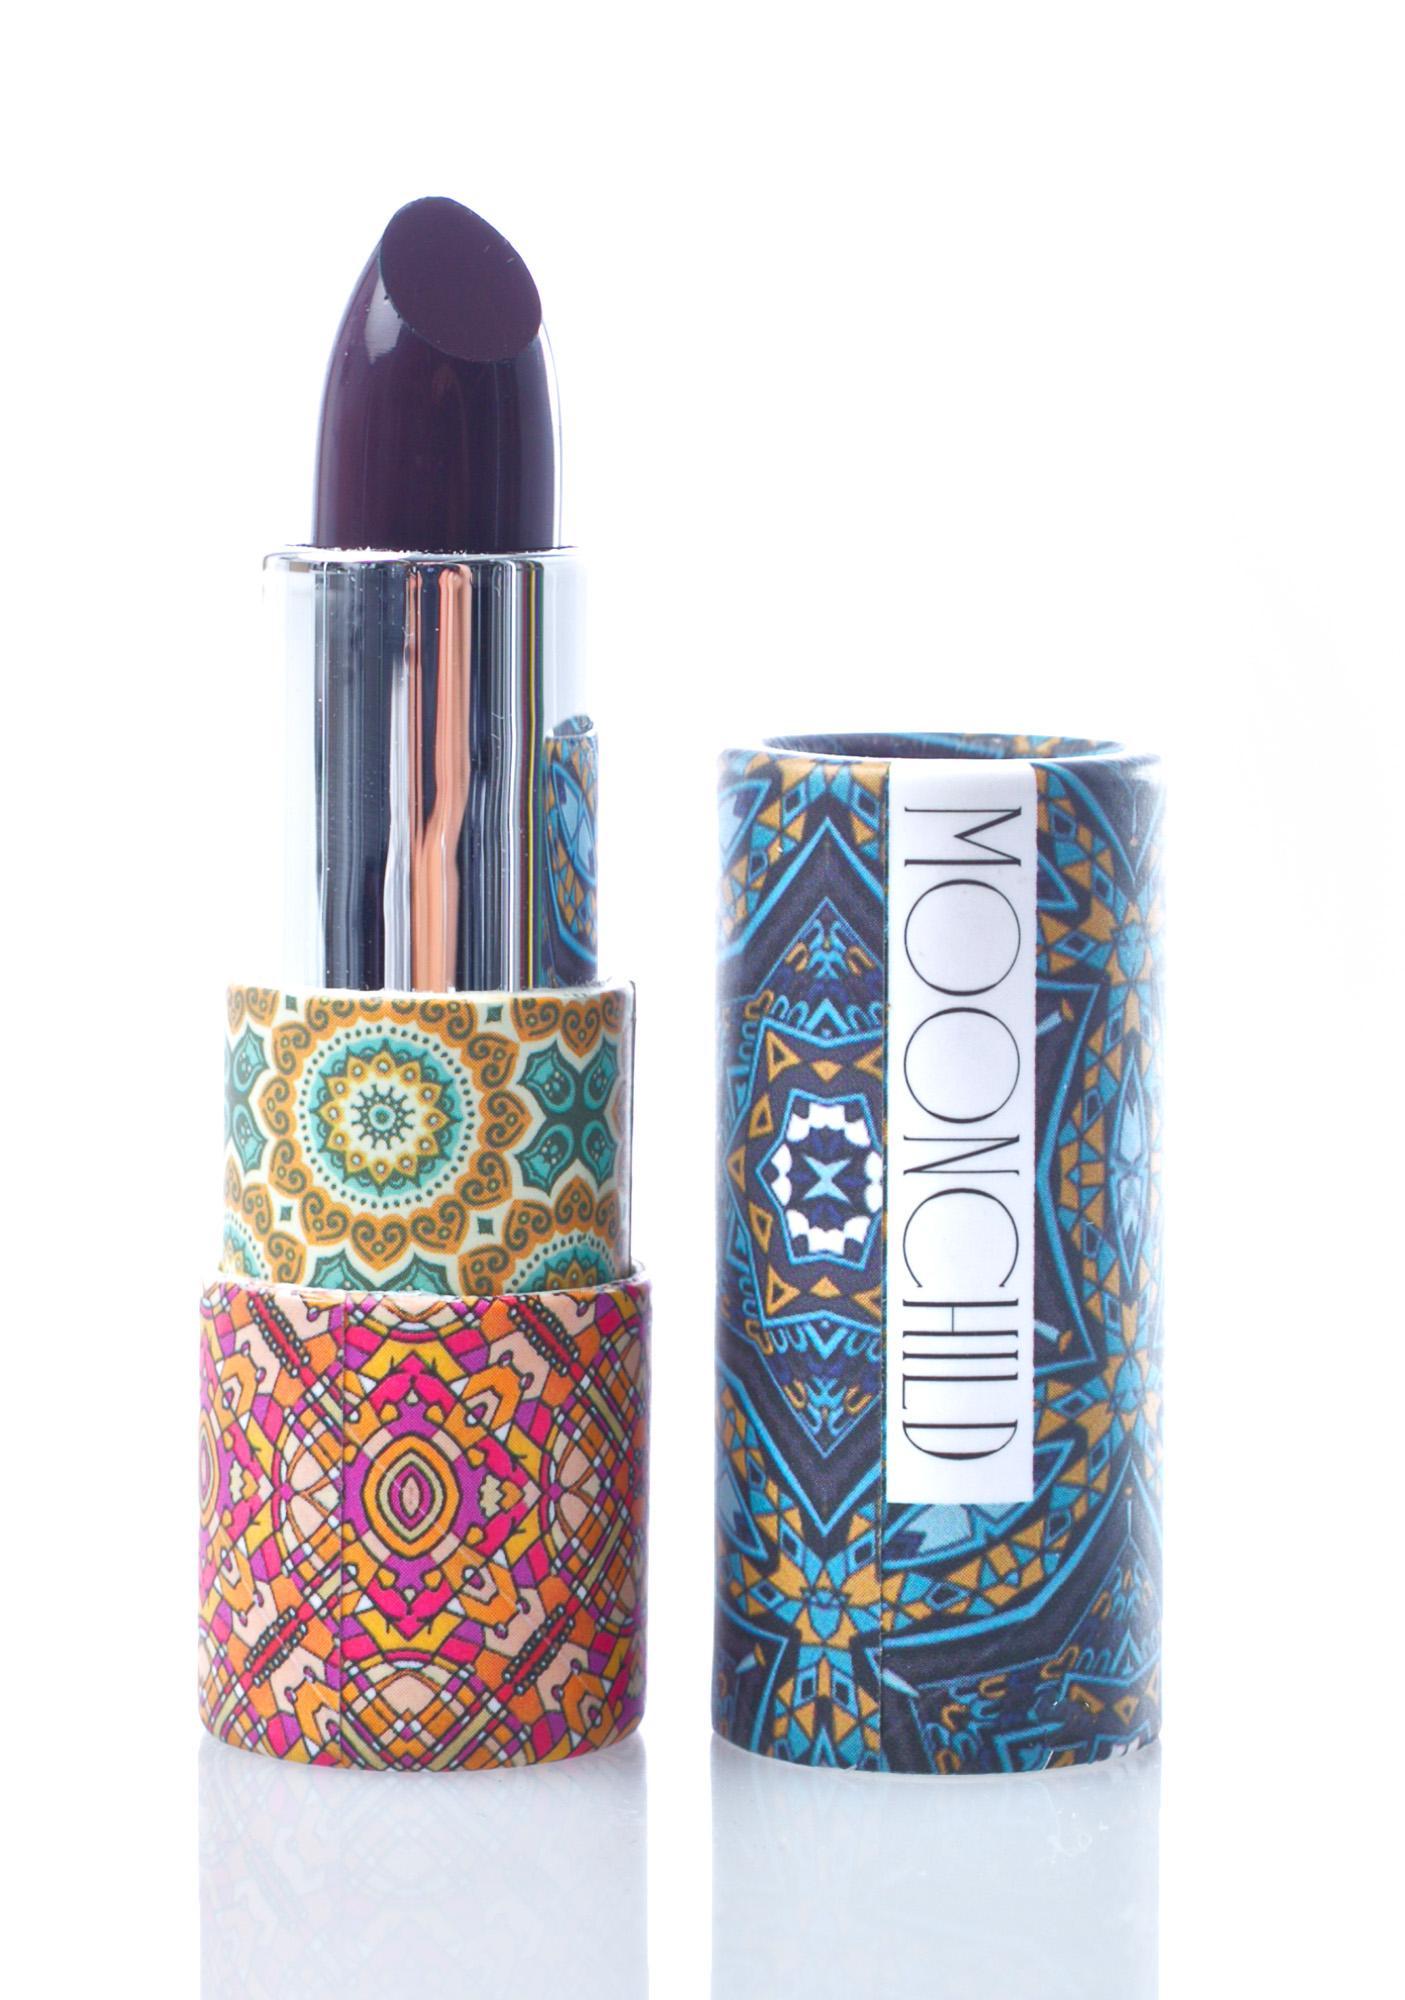 Moonchild Lipstick Naughty Lipstick